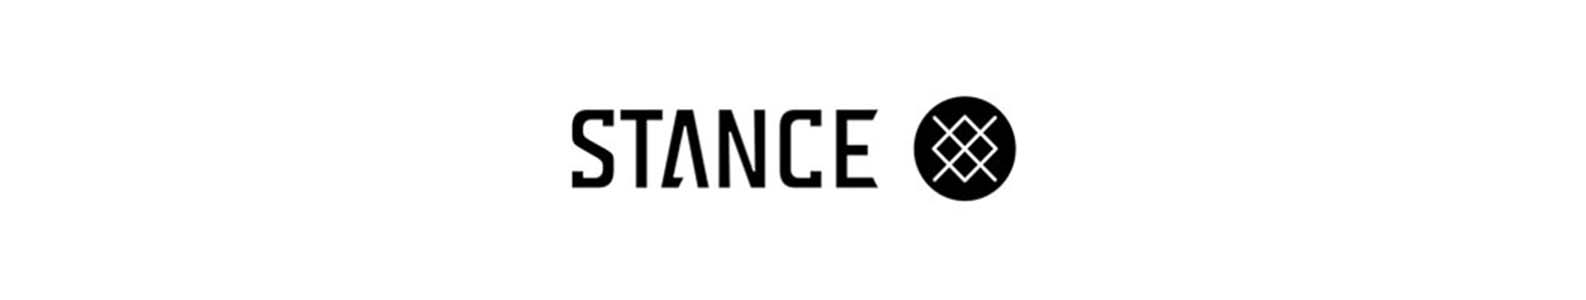 Stance brand header image